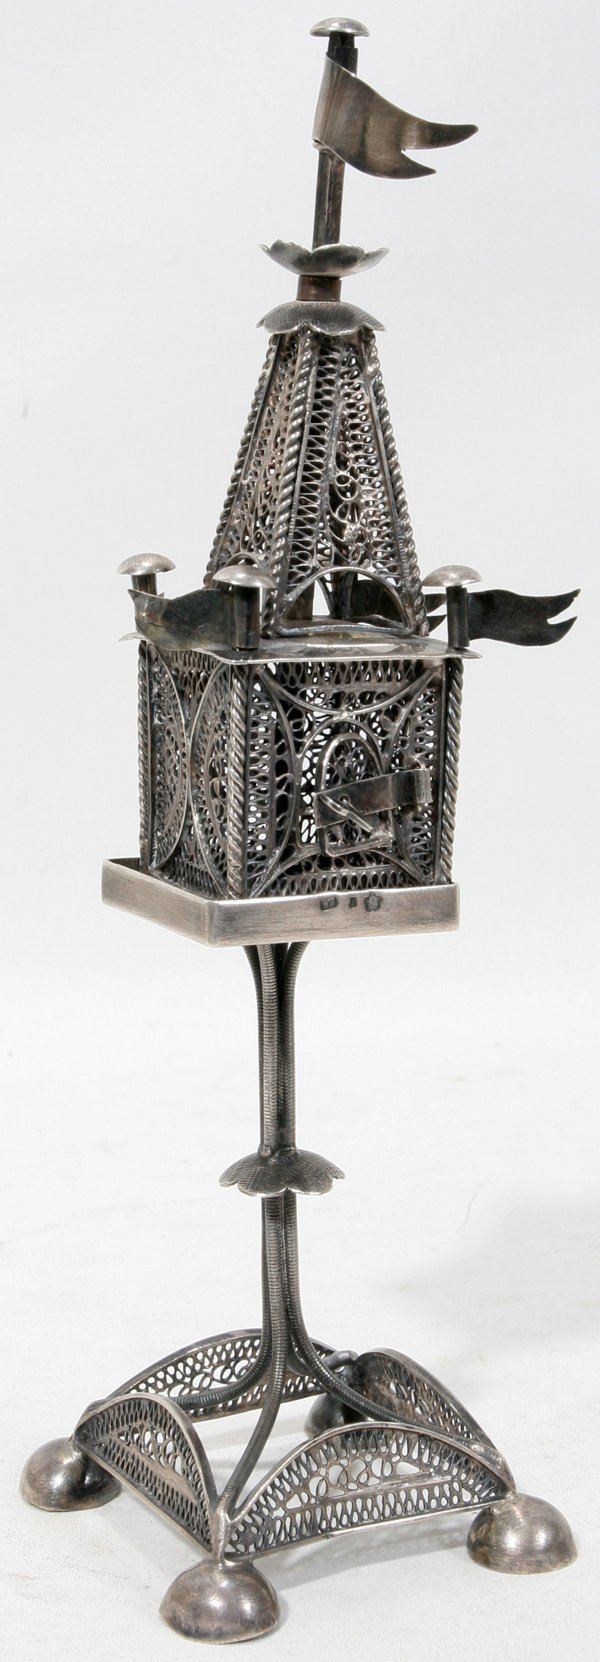 121014: AUSTRIA JUDAICA .800 SILVER SPICE TOWER